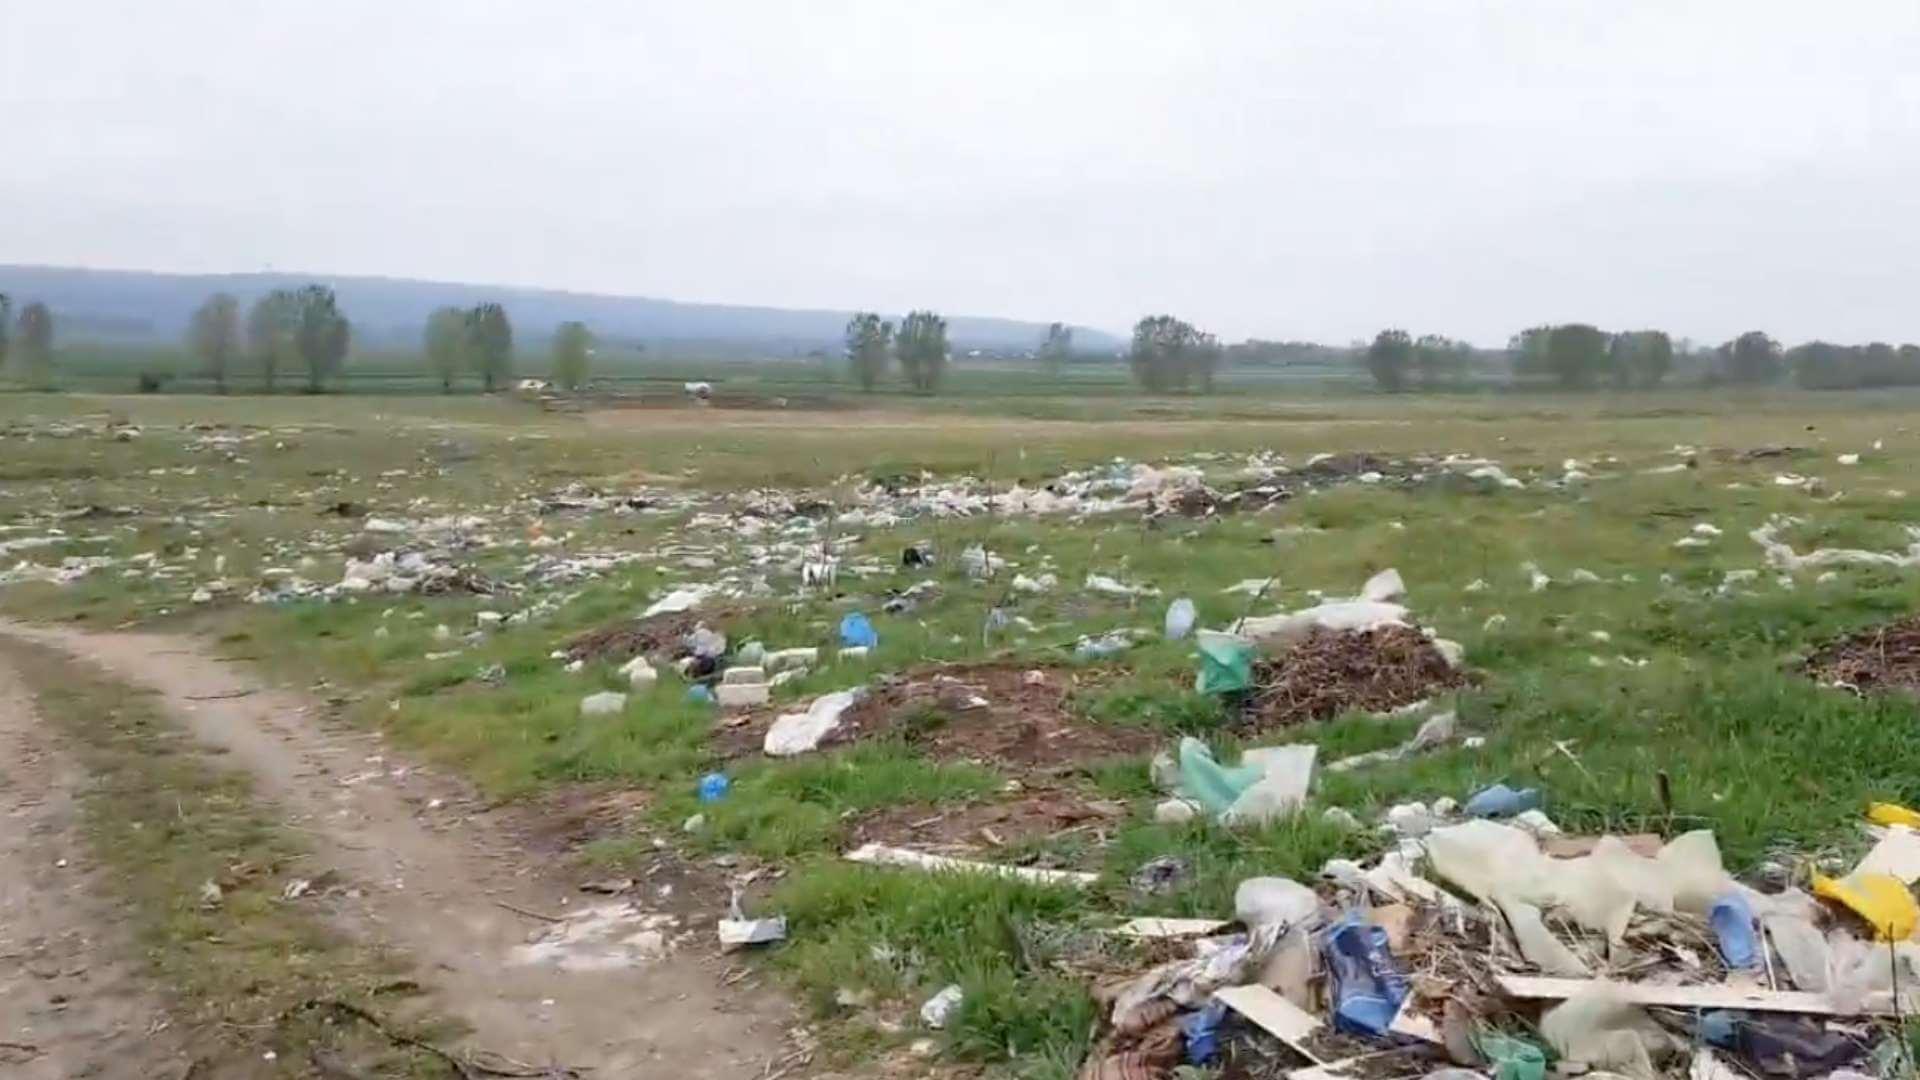 România 2021: pepeni care cresc printre gunoaie